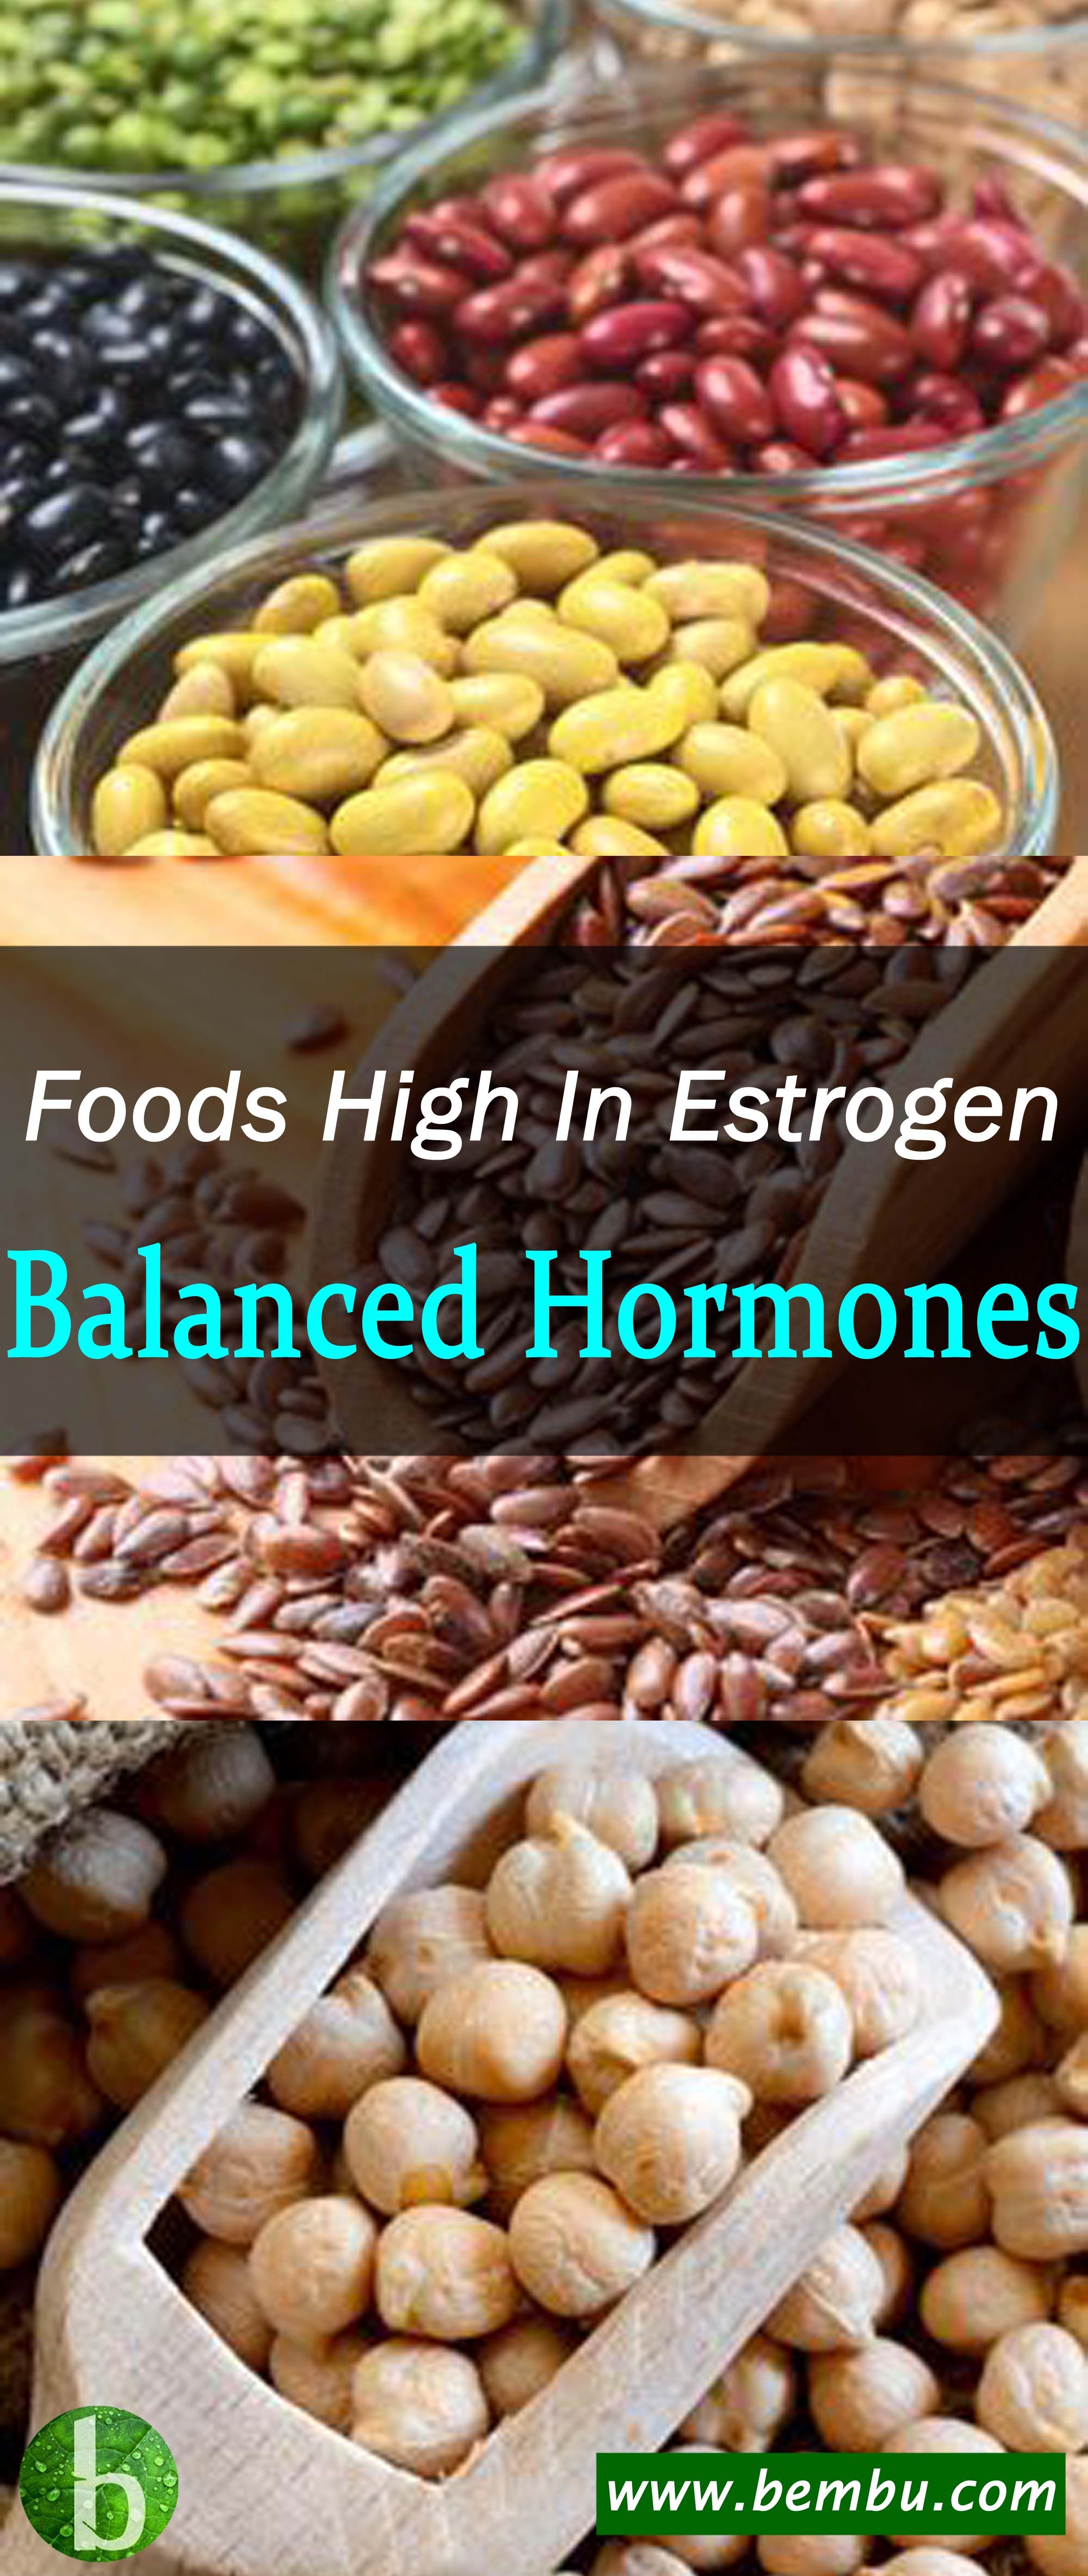 Estrogen rich food guide for boosting low levels